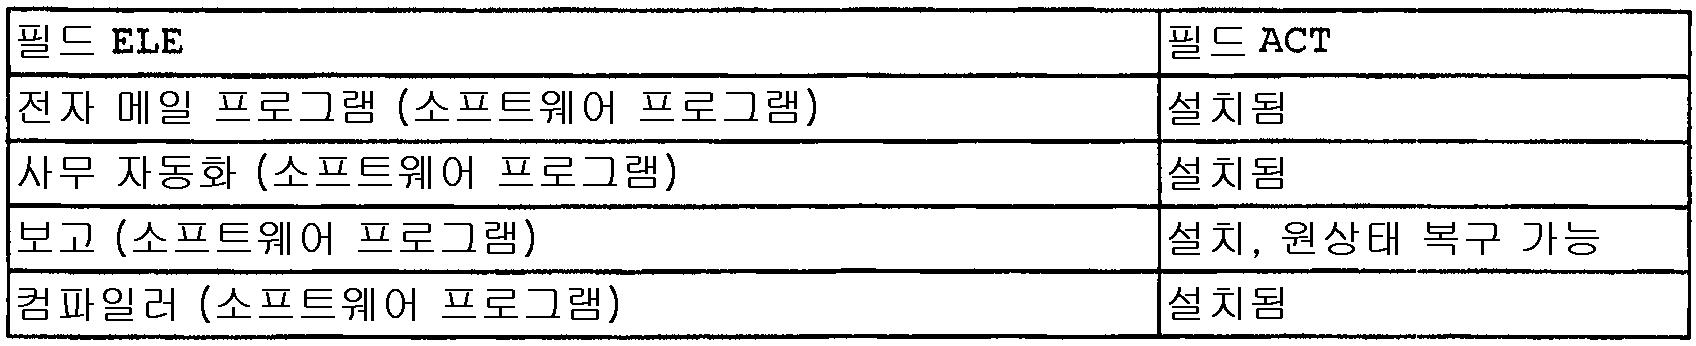 Figure 112003034646291-pct00004